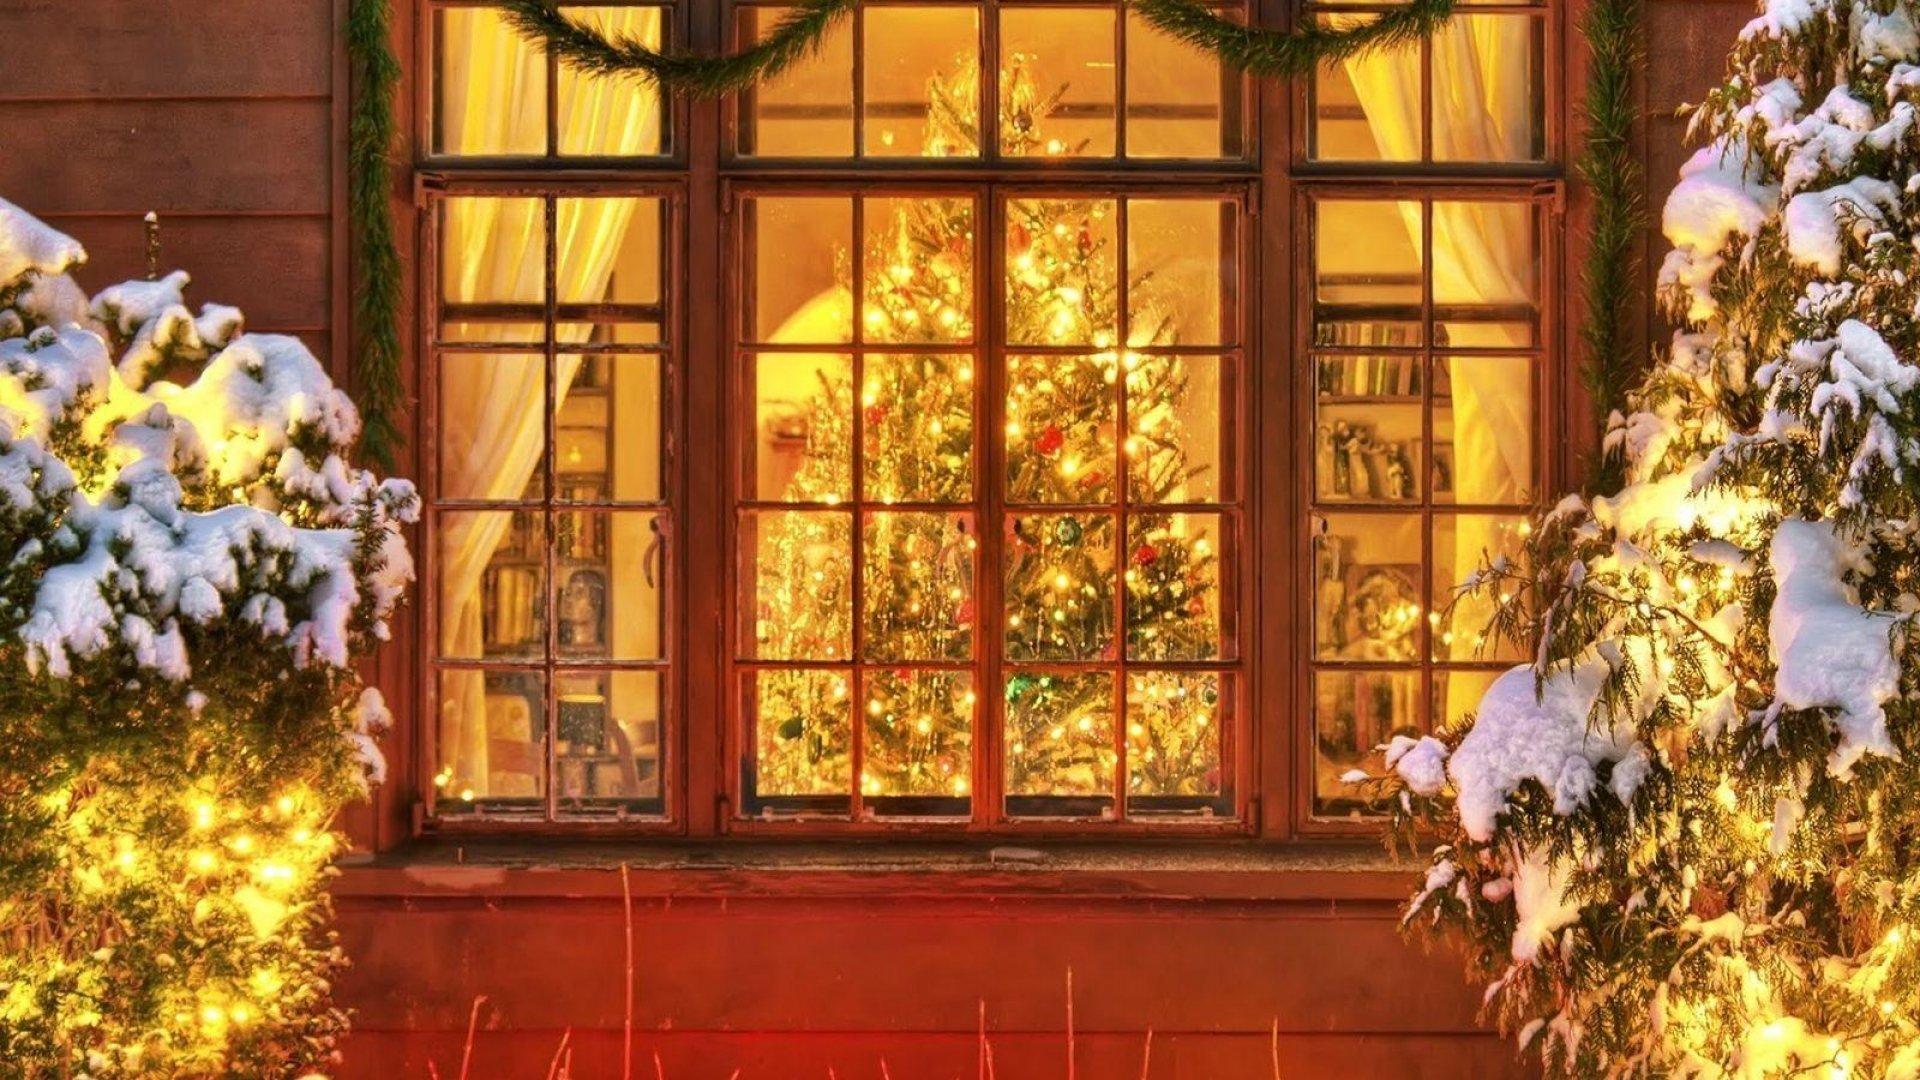 Christmas Tree Wallpapers 1920x1080 Full Hd 1080p Desktop Backgrounds